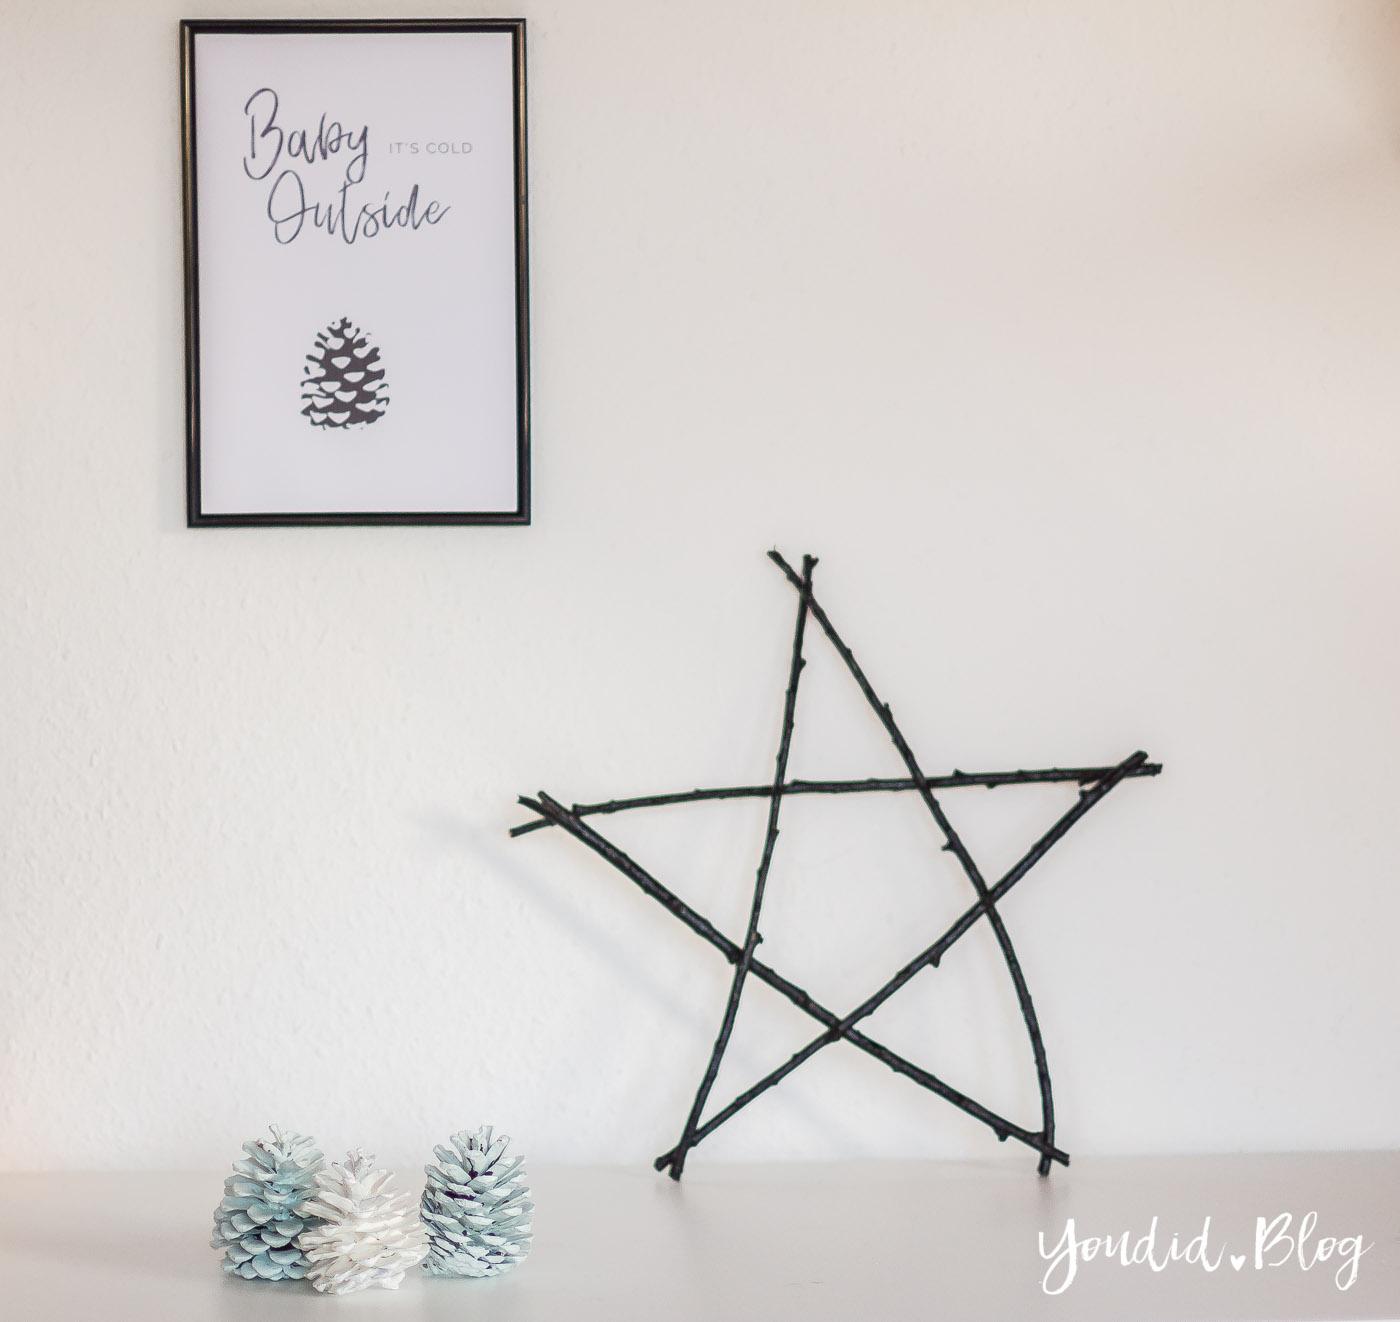 minimalistische skandinavische weihnachtsdeko linksammlung youdid. Black Bedroom Furniture Sets. Home Design Ideas